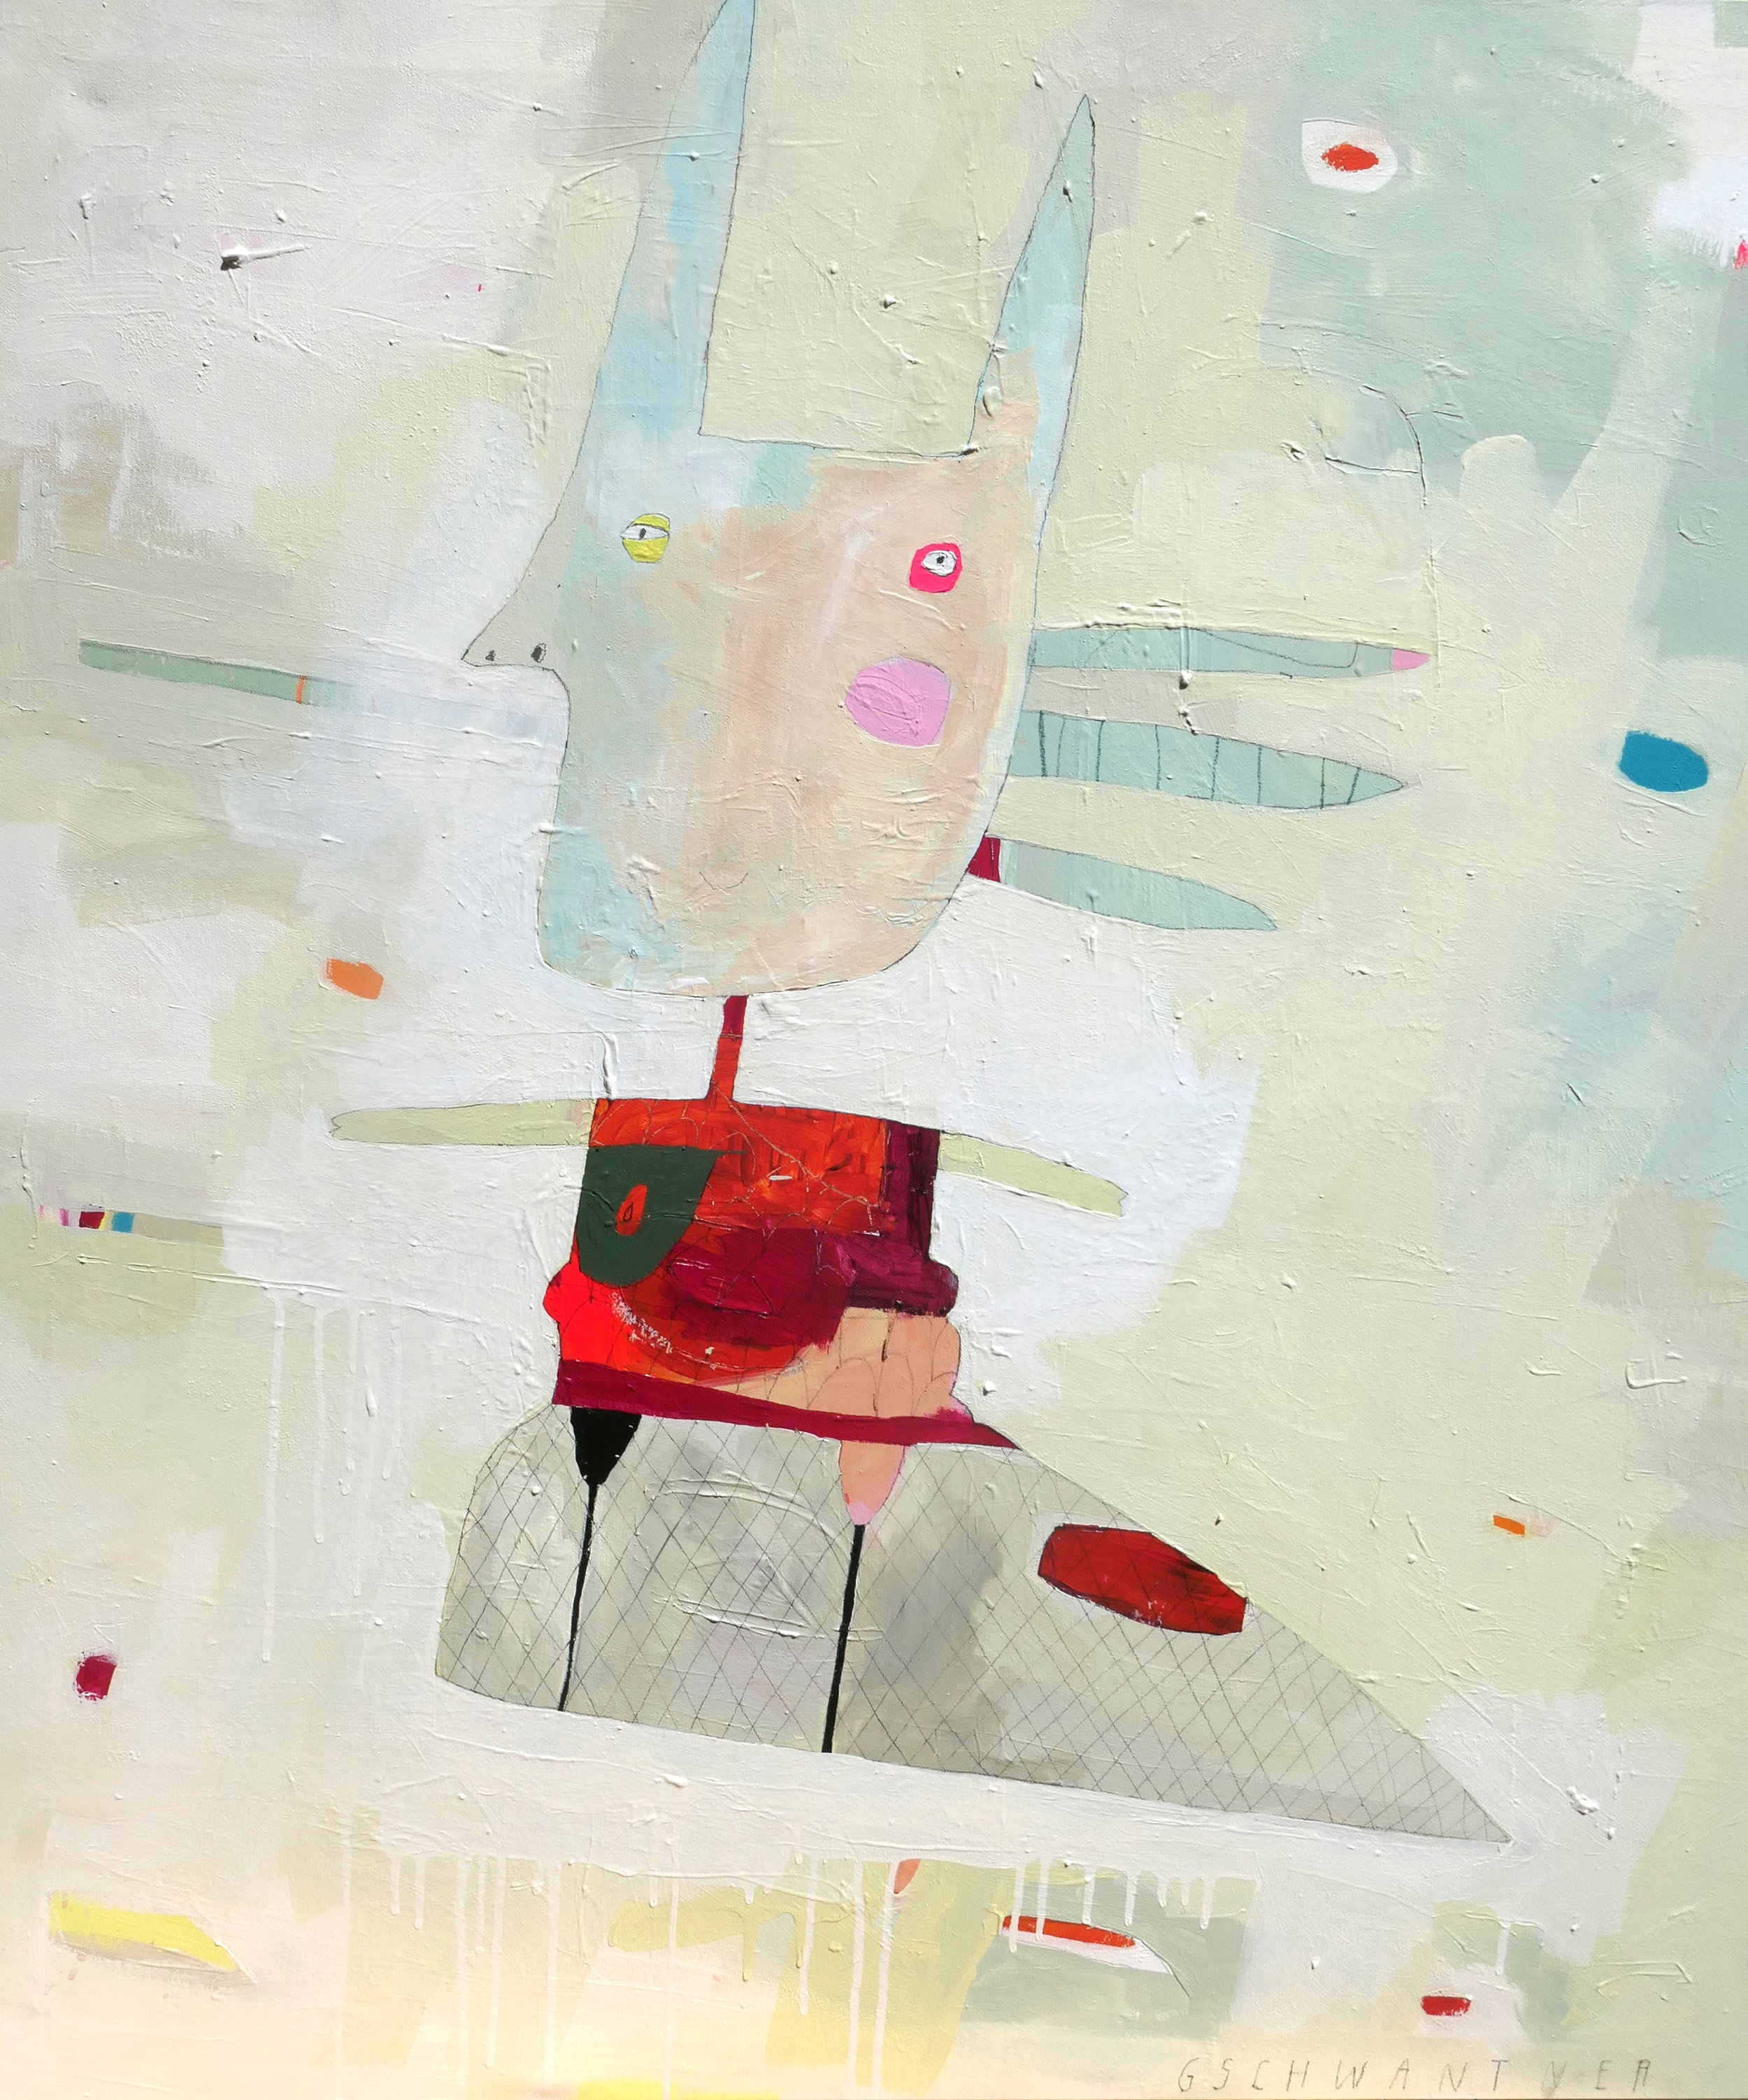 Wasserspitznasennacktschneck, 2017, Acryl auf Leinwand, 113 x 104cm, Ausrufpreis 1500,-